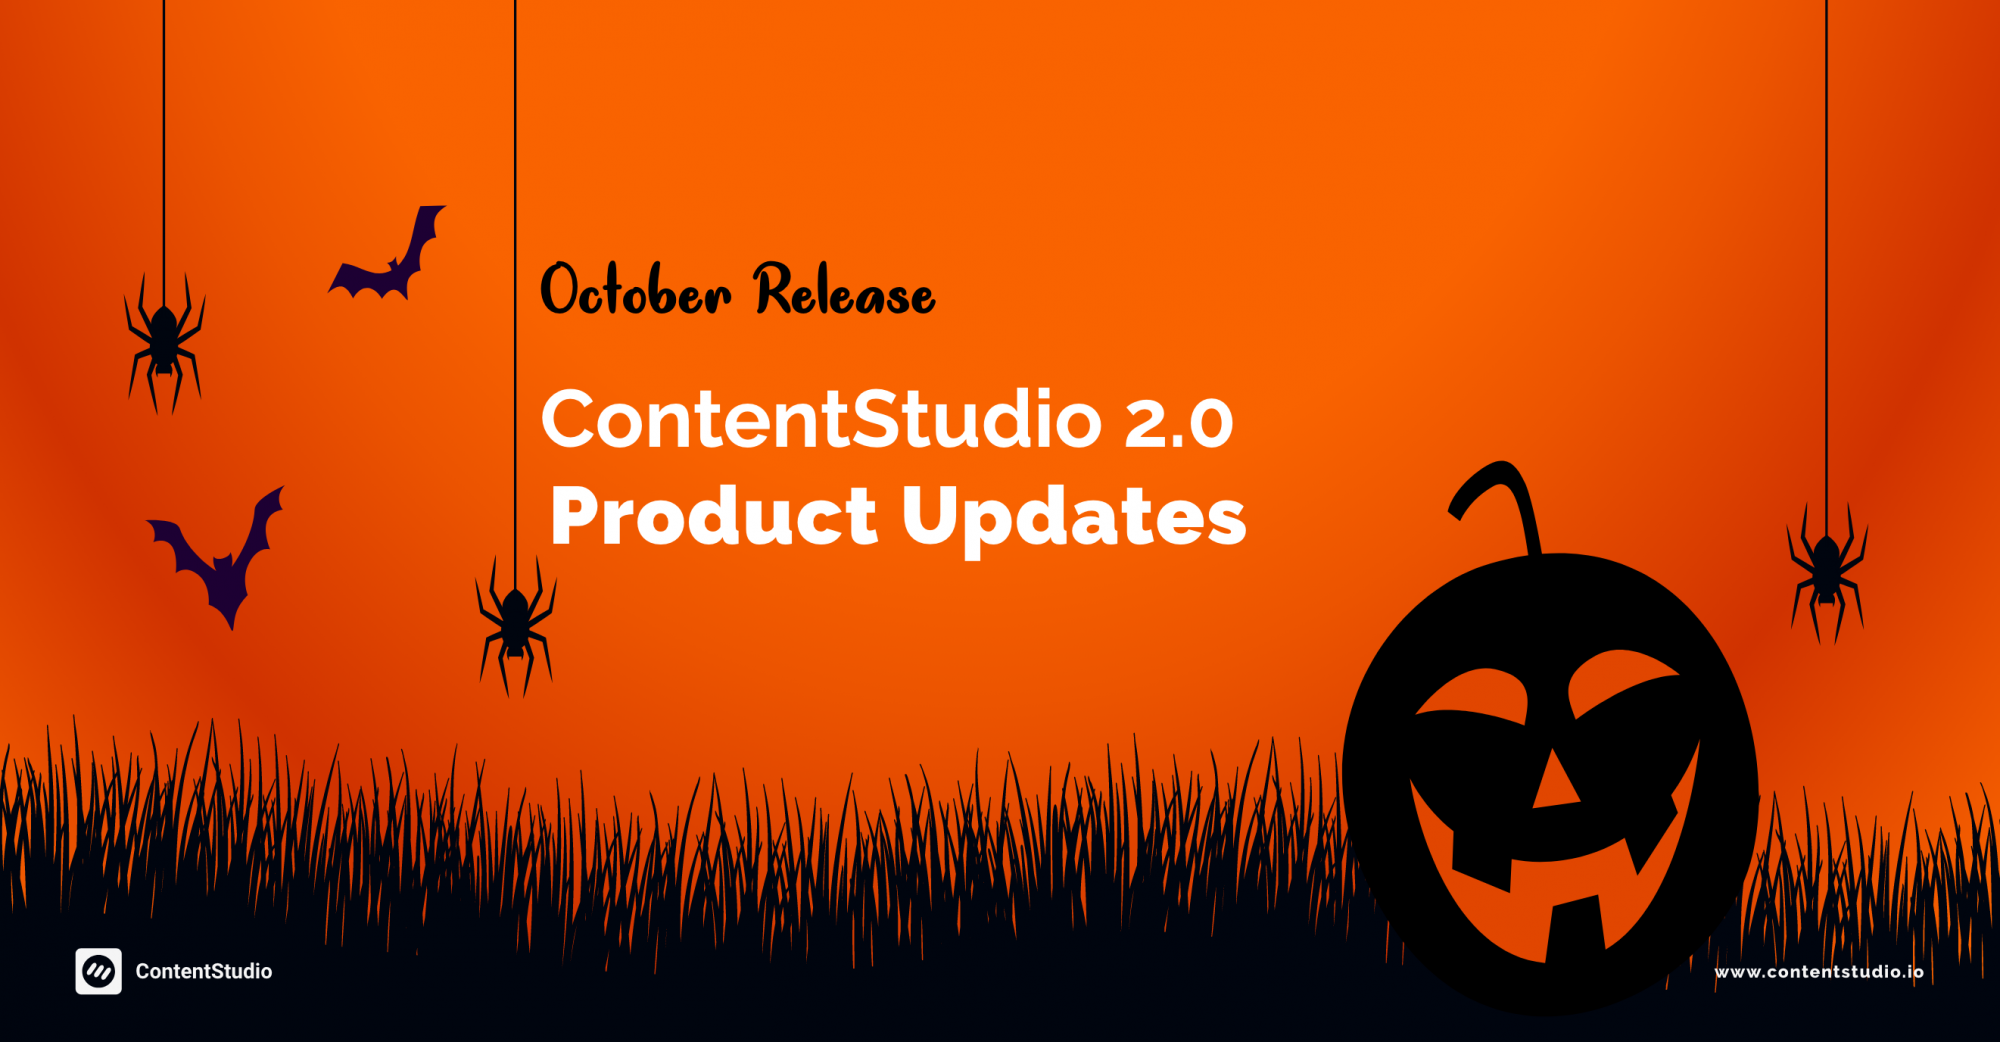 ContentStudio Feature Updates